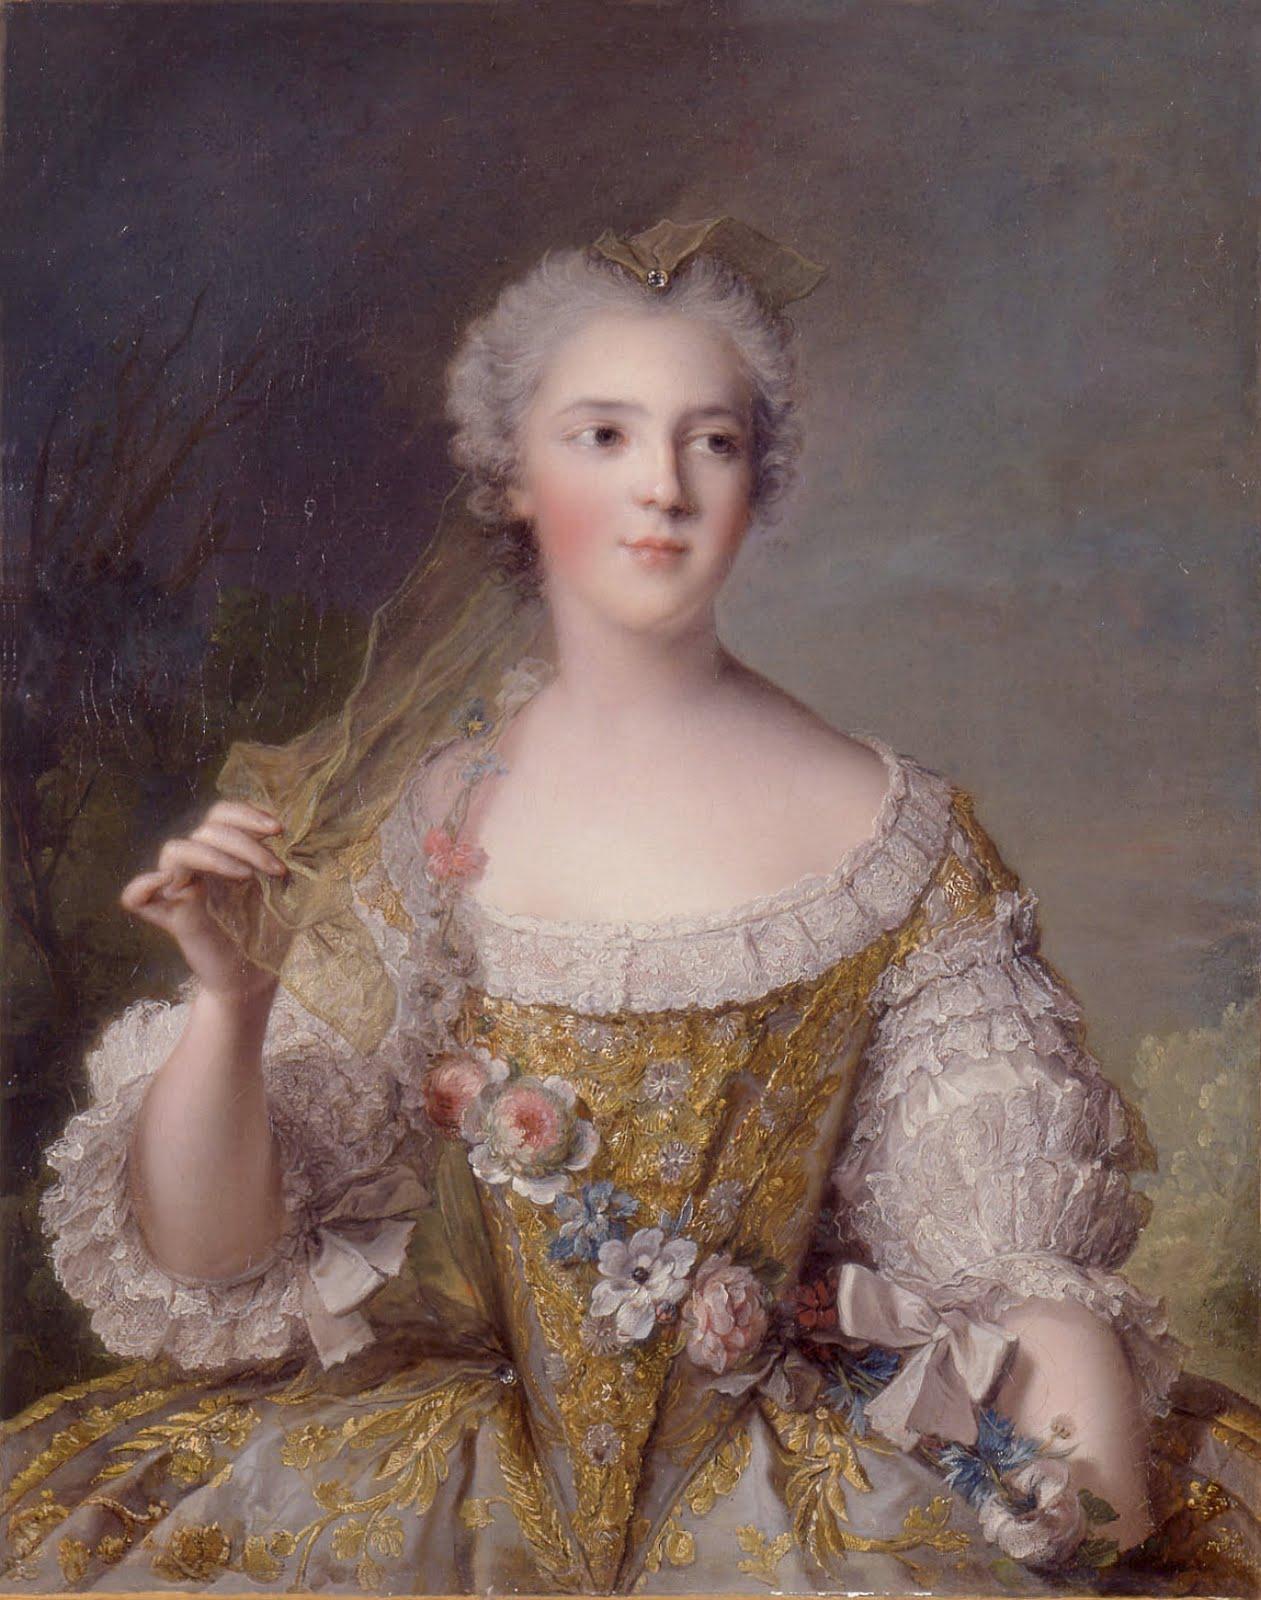 18th century women theater makeup 18th century women